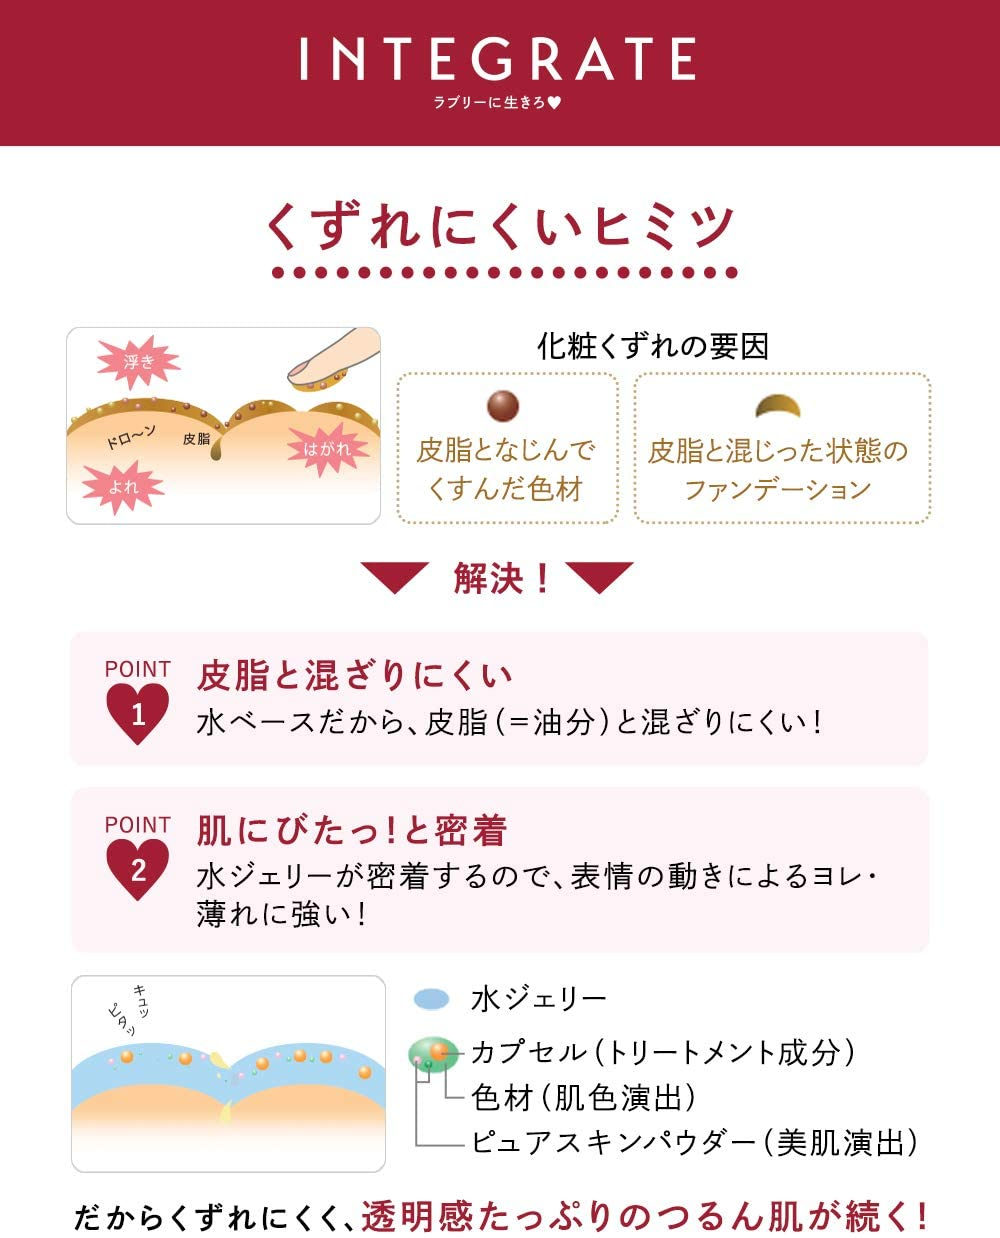 Shiseido SPF 30 foudation phấn nhật